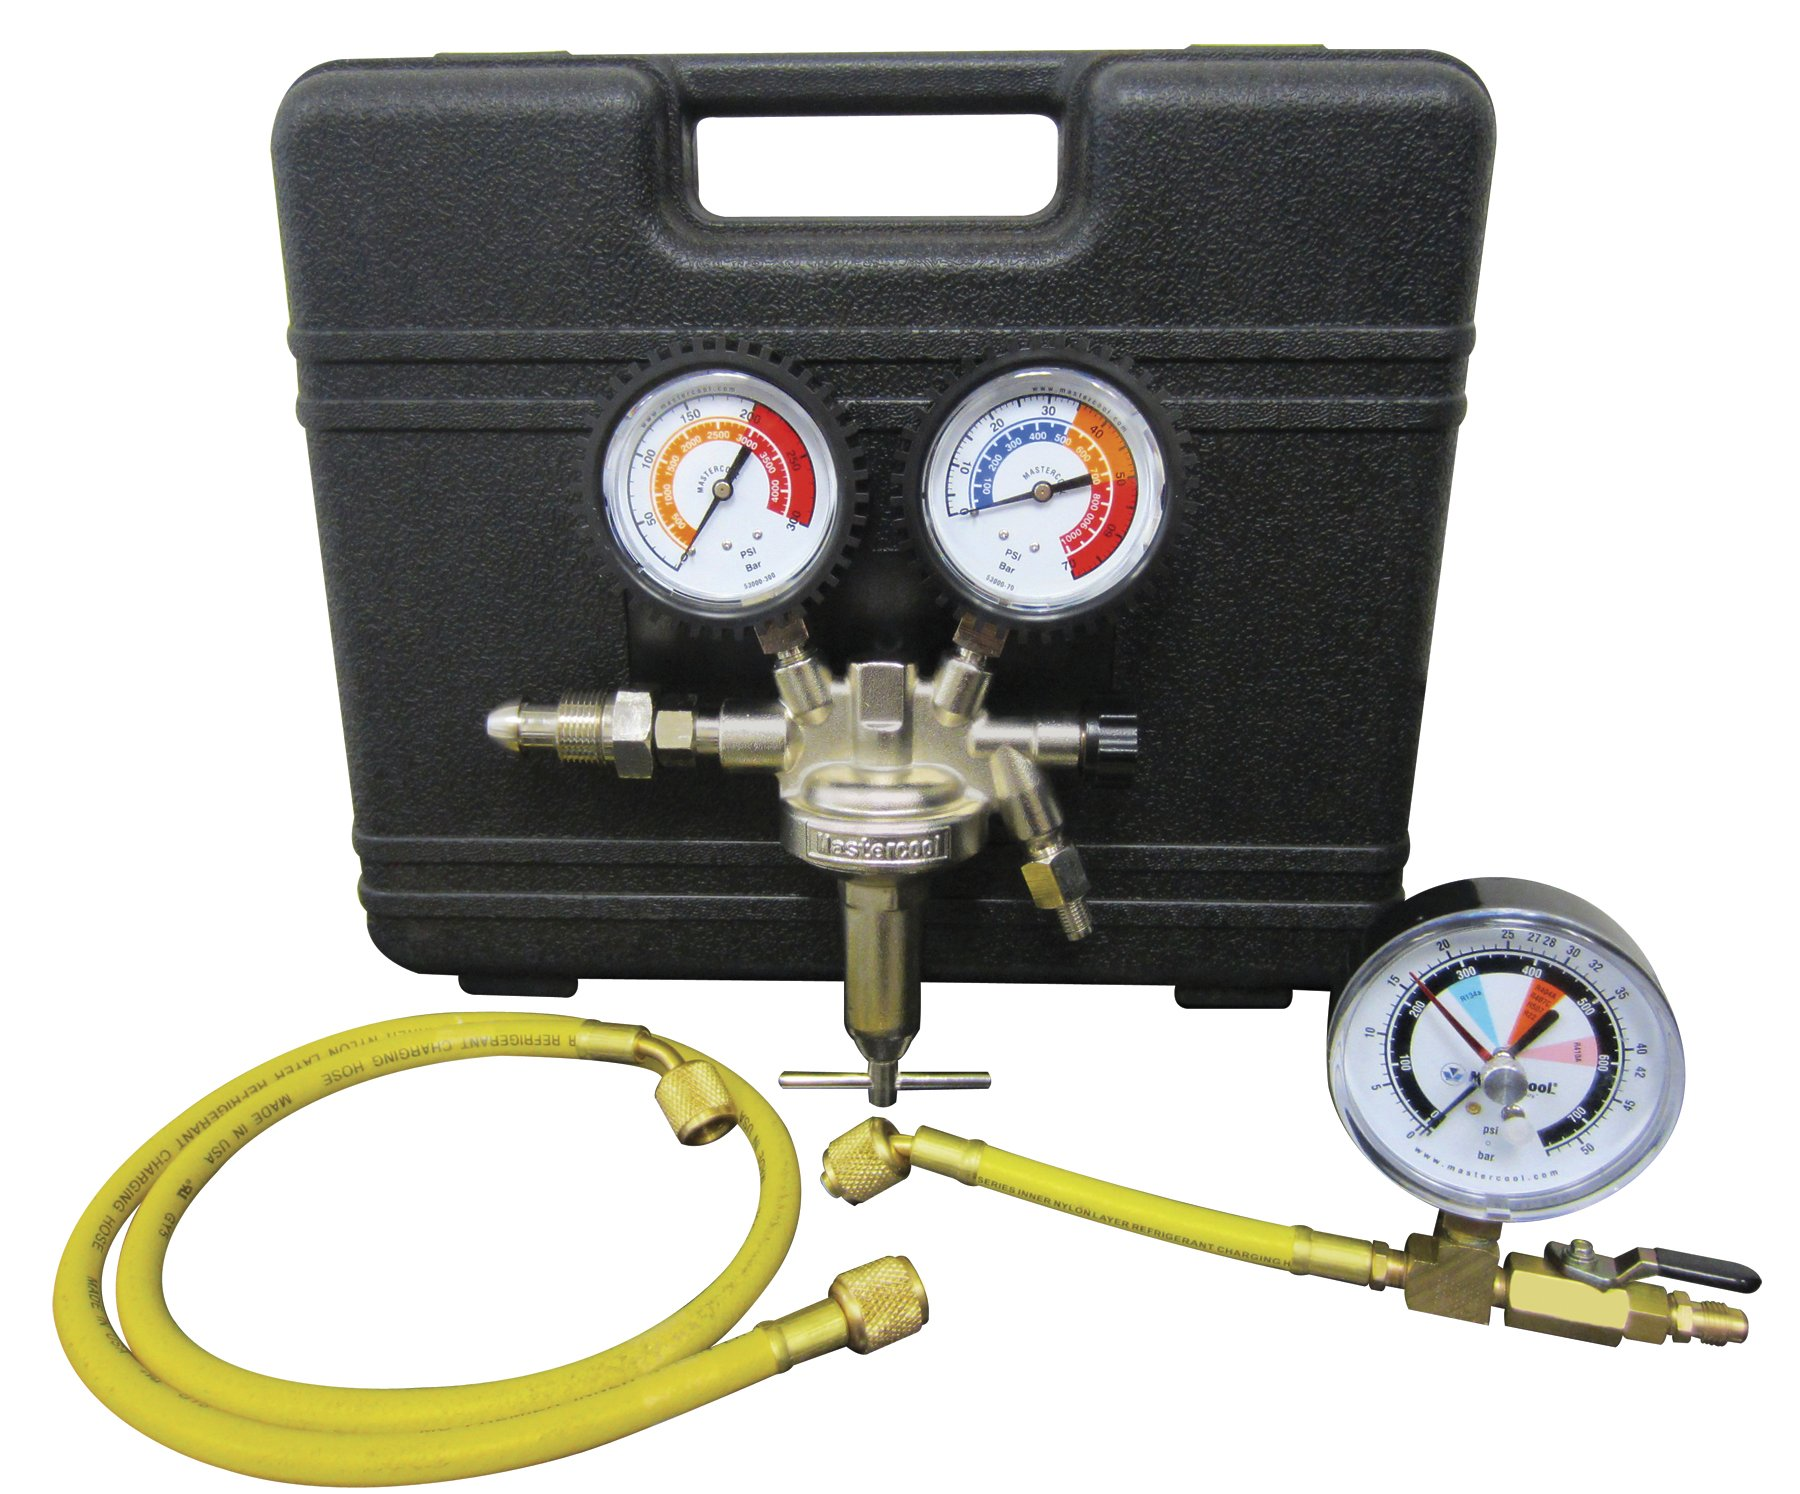 Mastercool (53010) Silver Pressure Test Regulator Kit